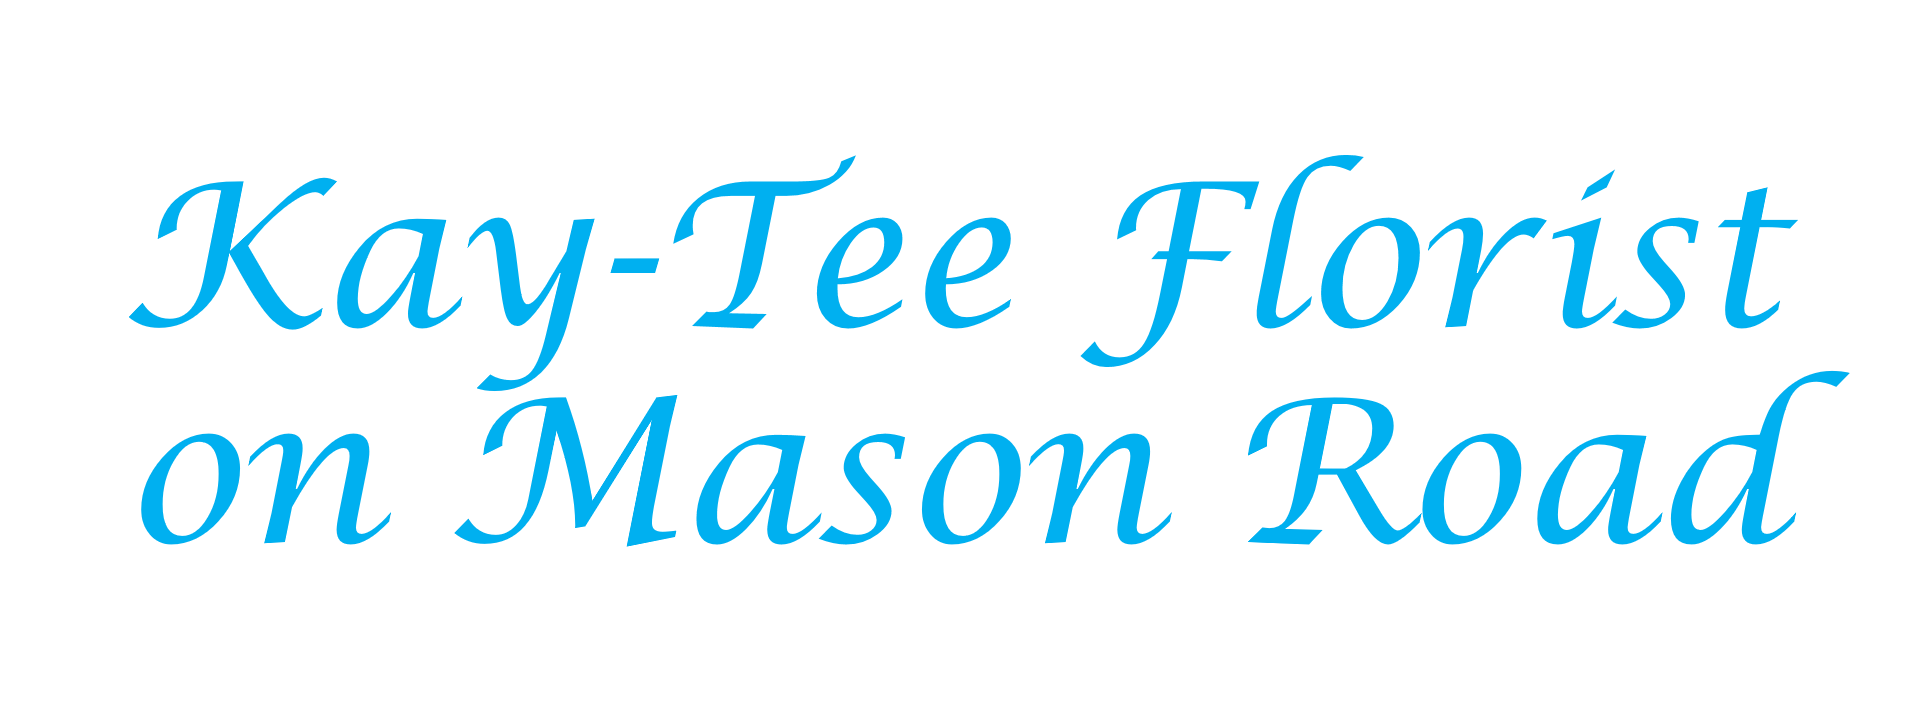 Kay-Tee Florist on Mason Road